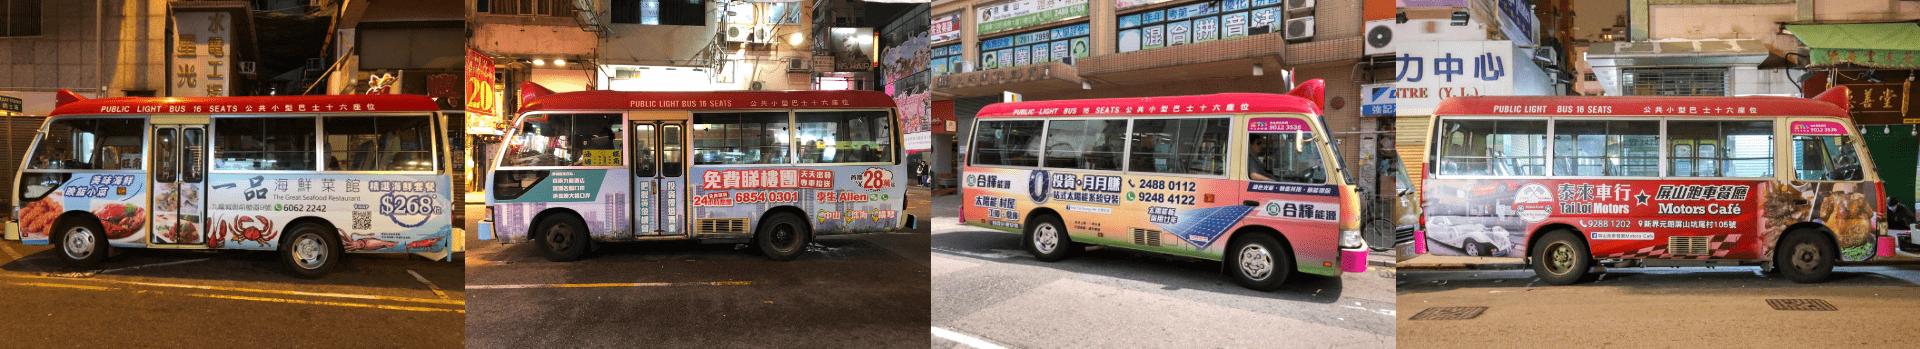 360-degress-view-mini-bus-with-exterior-advertisement-design